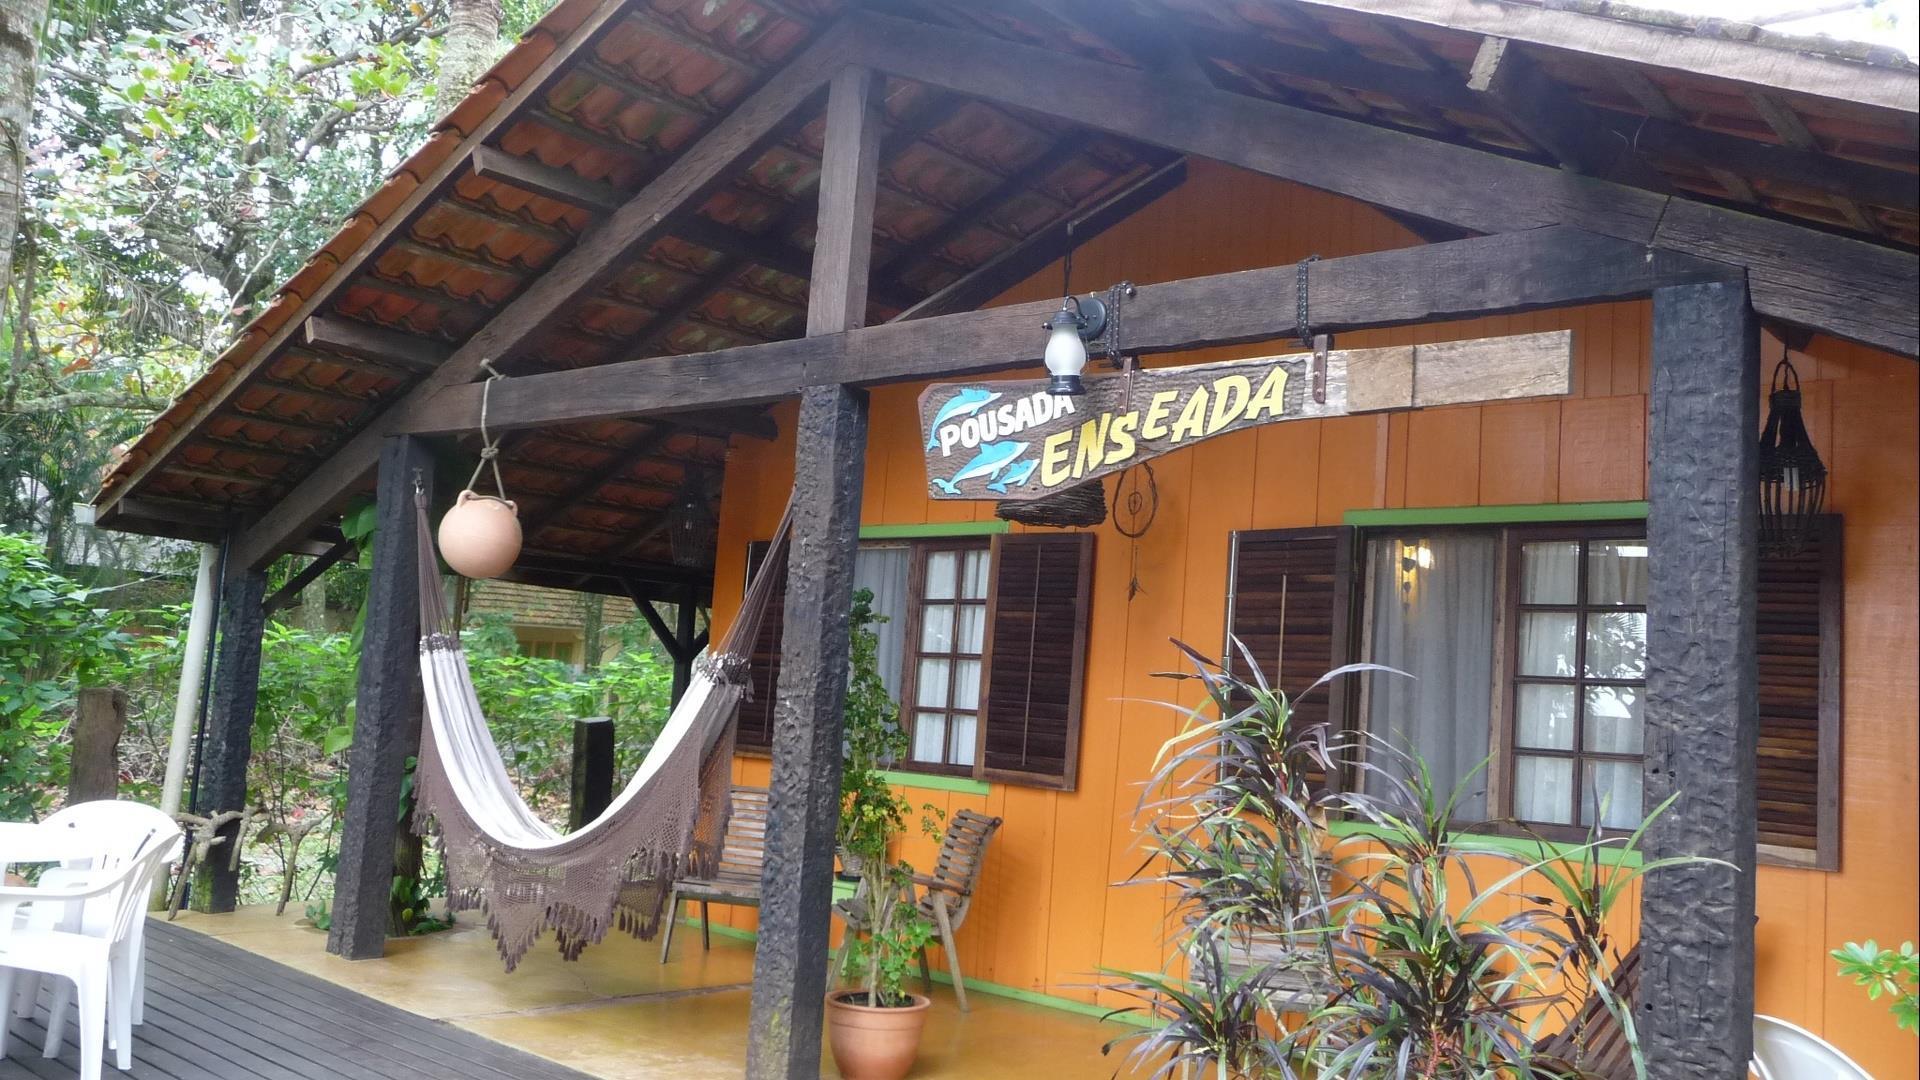 Brasilien Ilha do Mel: Landestypische Unterkunft - Pousada Enseada das Conchas